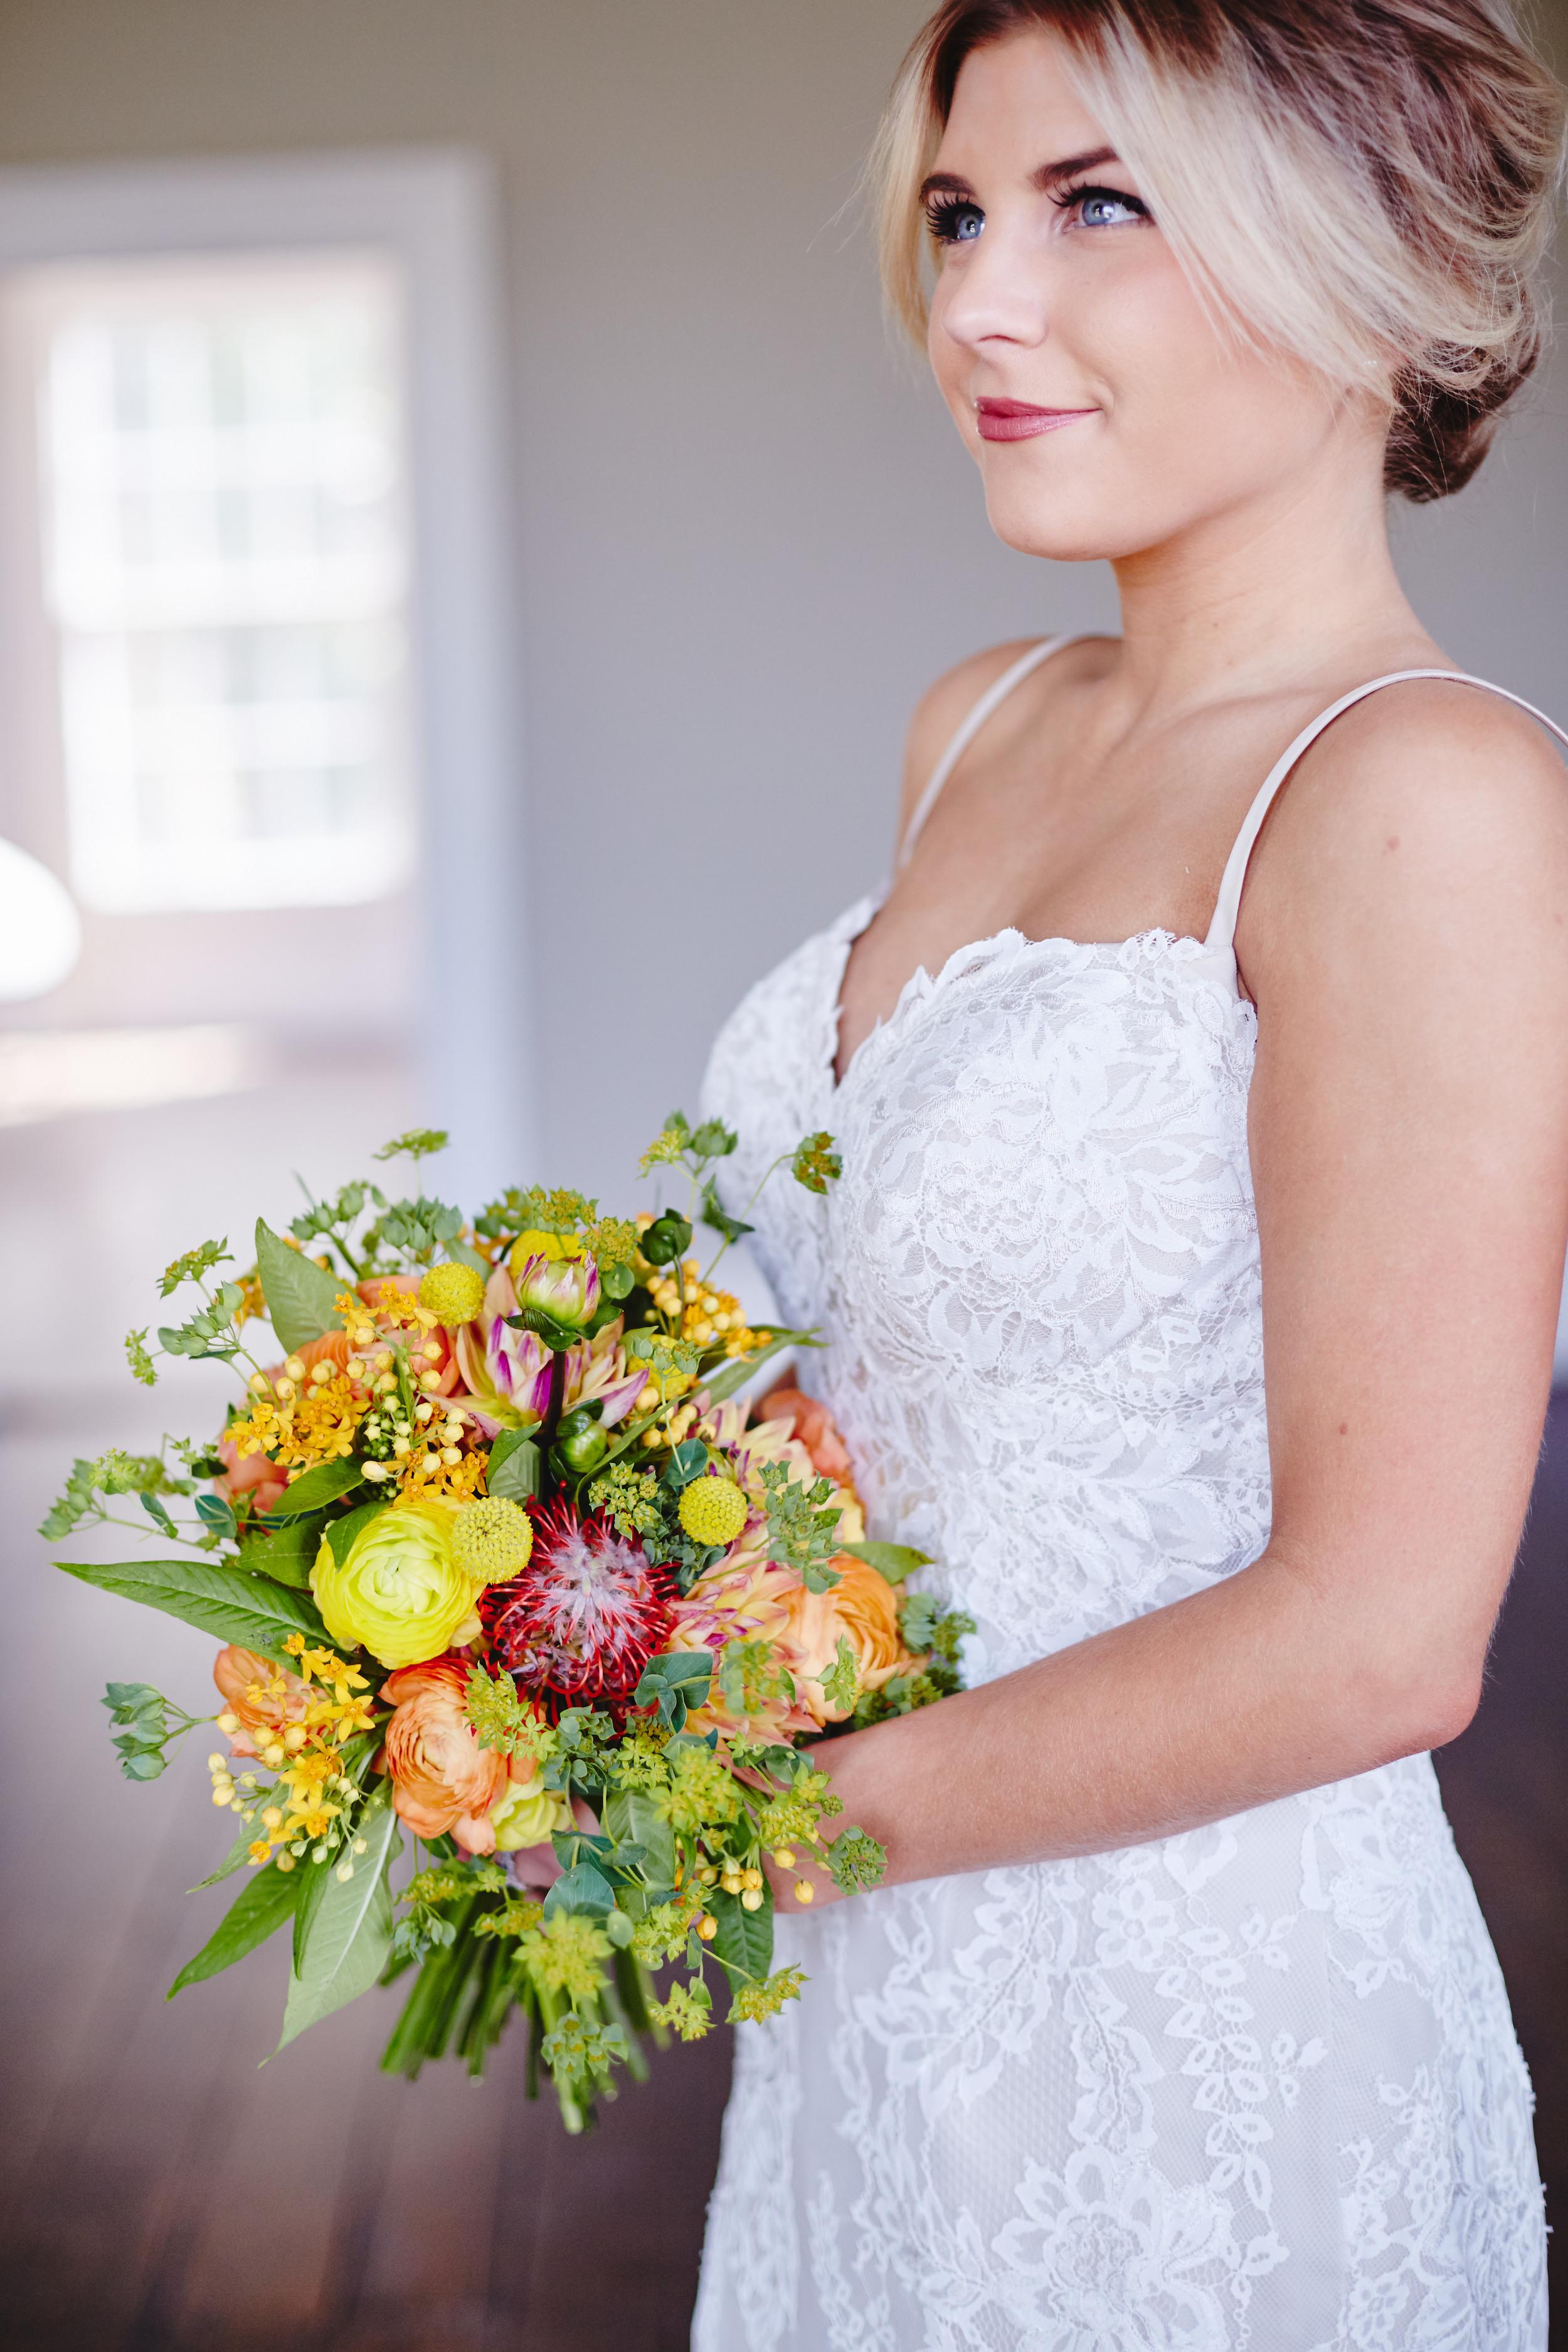 Styled_Session_Becca_Bridal_Portraits_Sarah_Tau_Photography_HOB_Studio_285 105.jpg